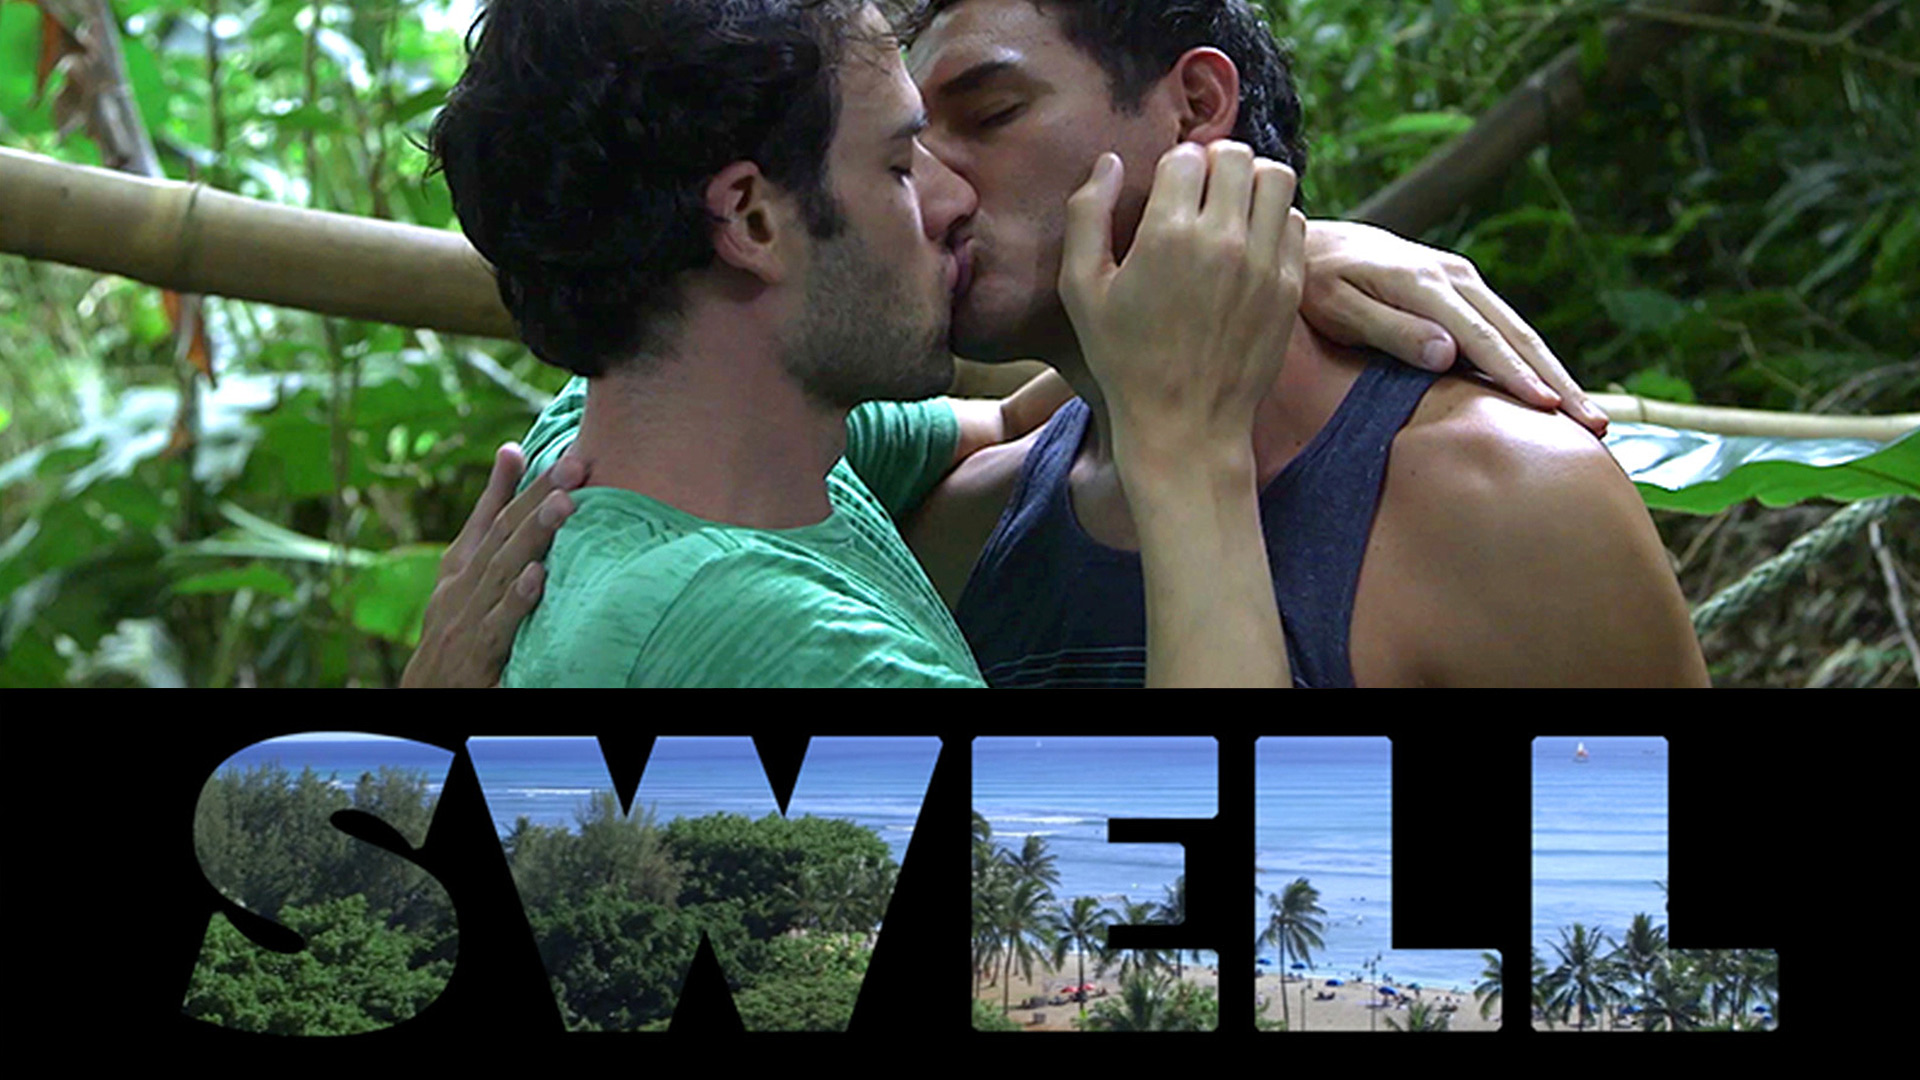 Swell - Season 1